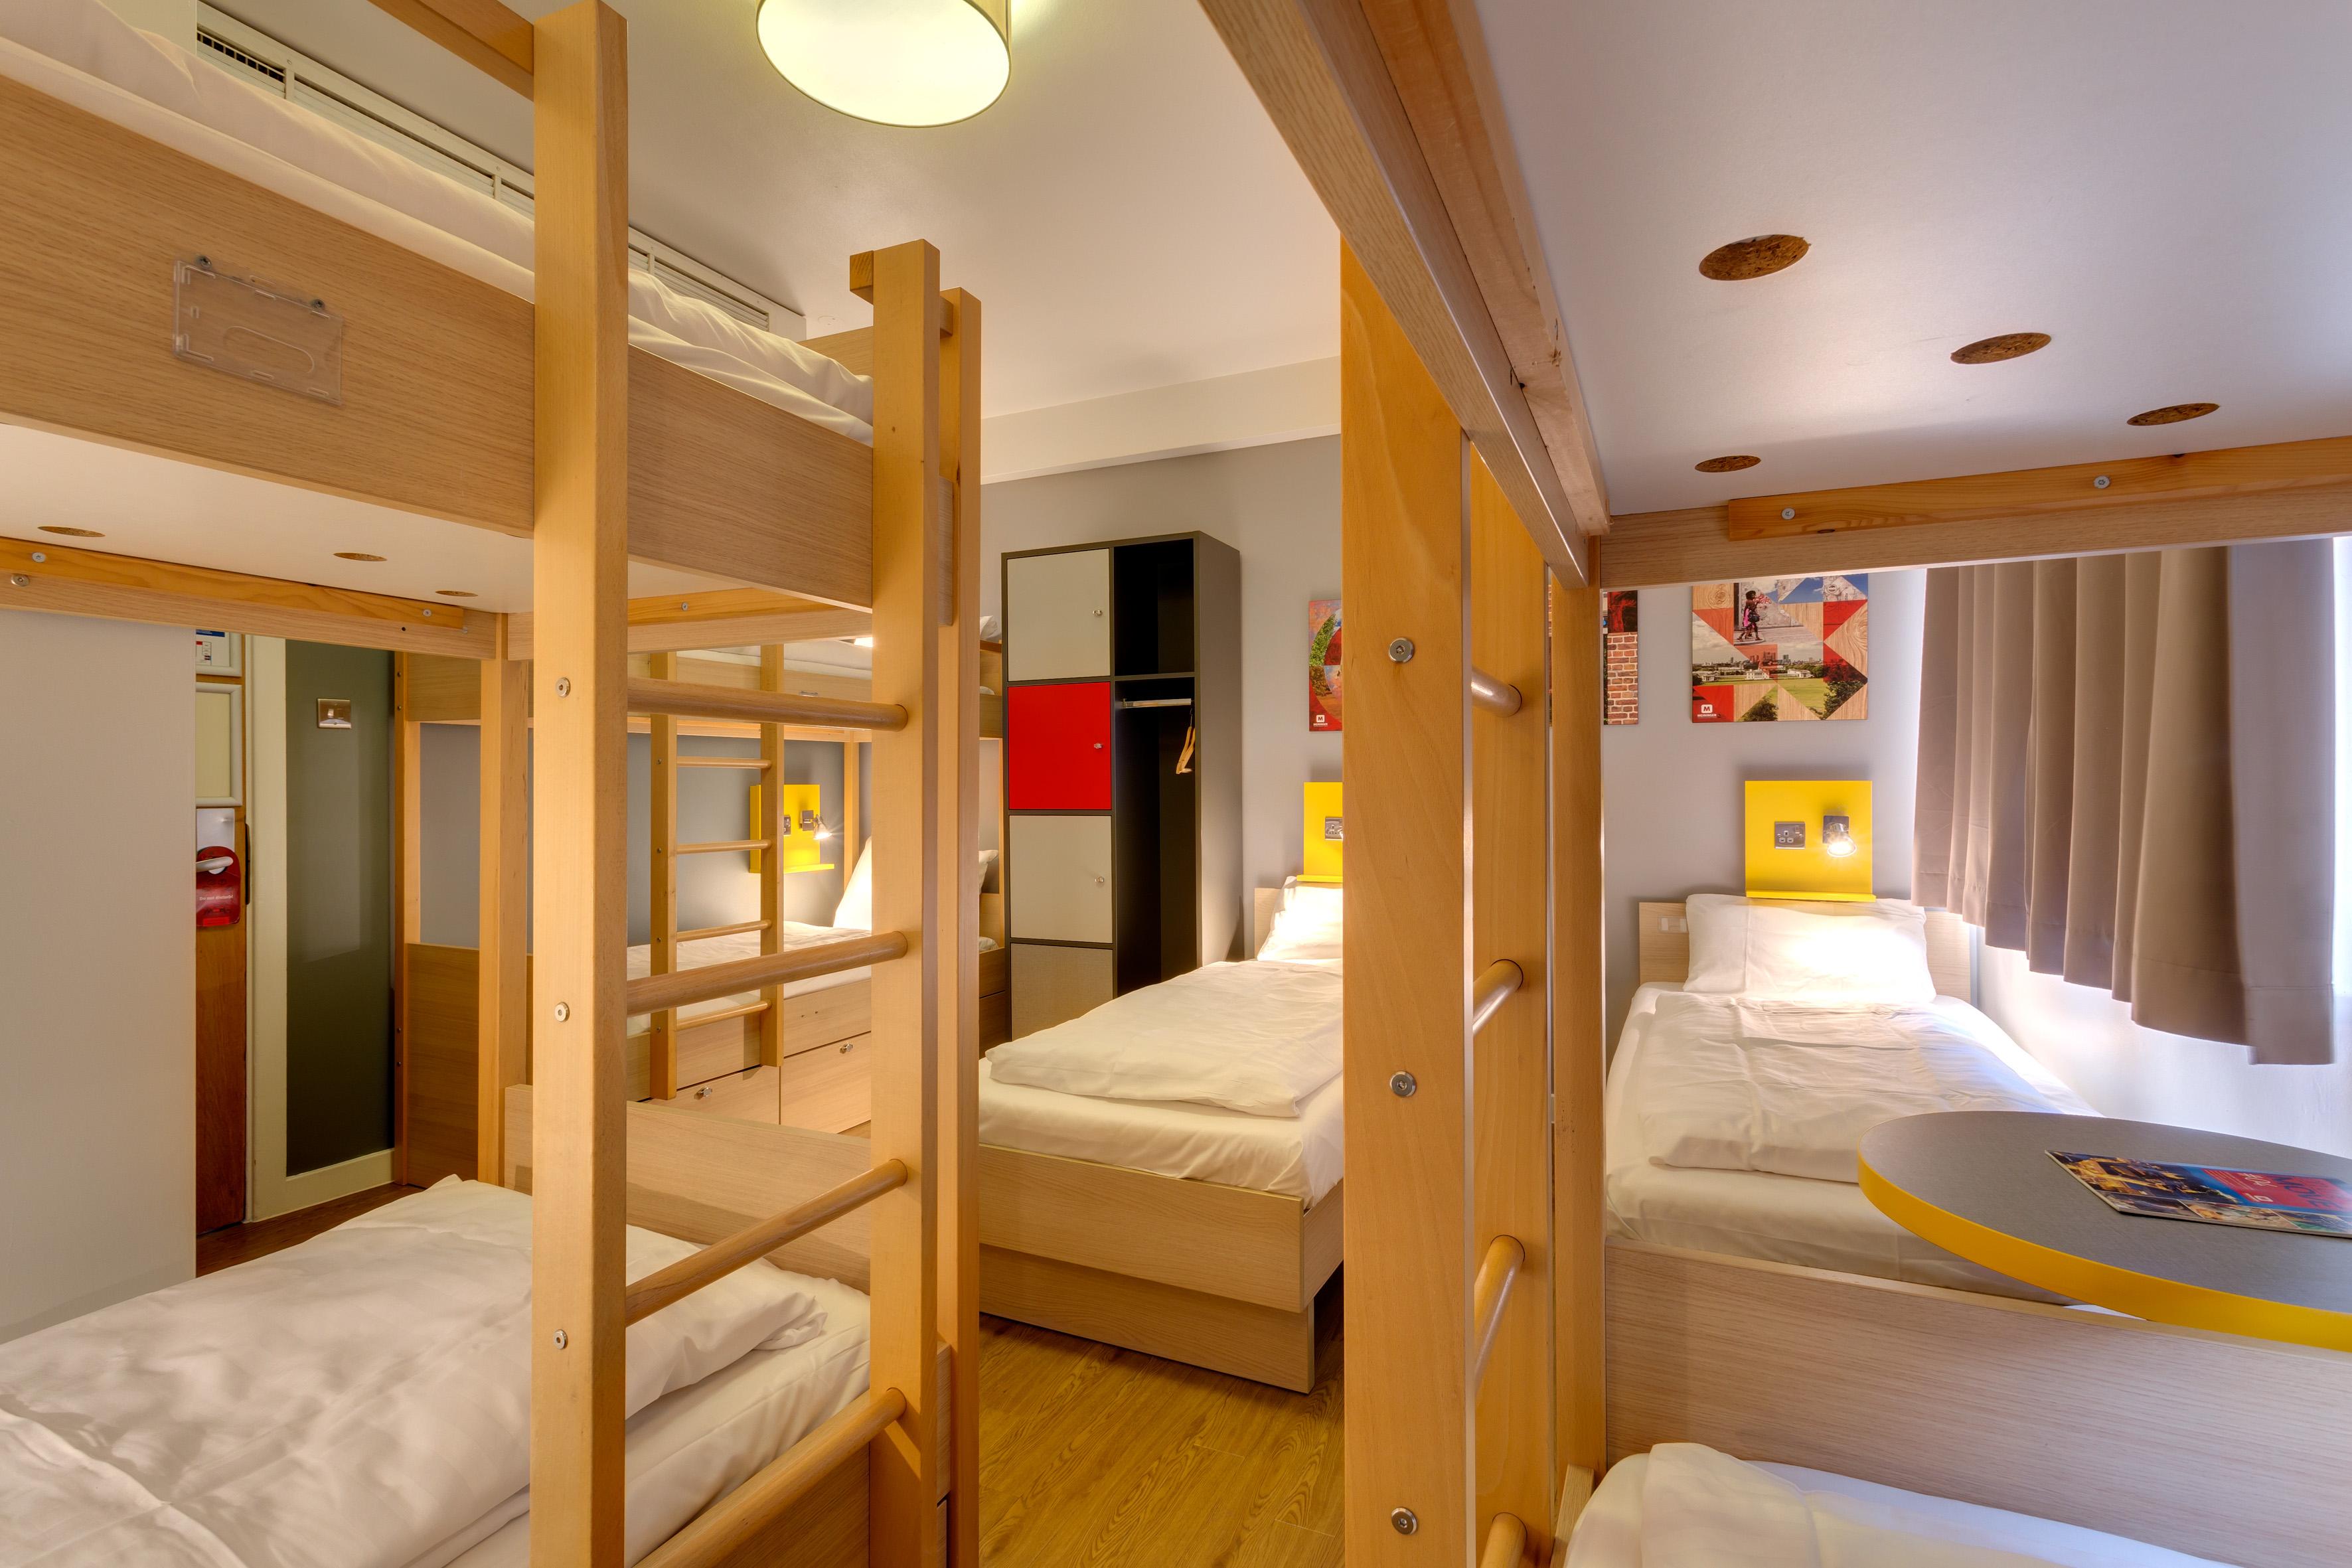 MEININGER Hotel London Hyde Park - Dormitory